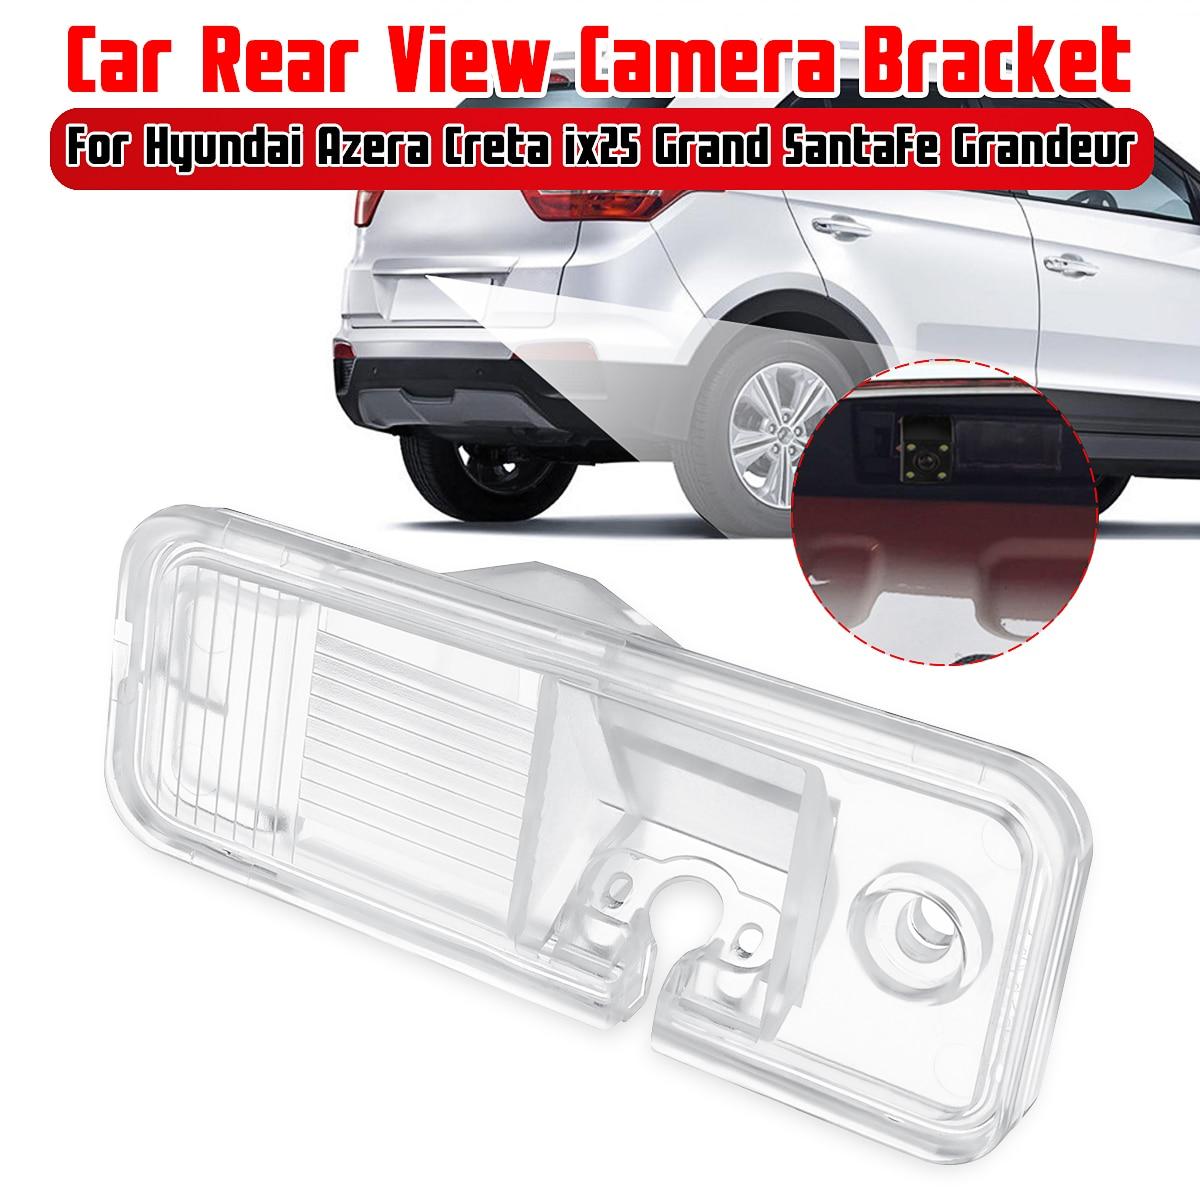 Car Parking Rear View Camera Bracket License Plate Cover Case Housing Mount For Hyundai Azera Creta Ix25 Grand SantaFe Grandeur